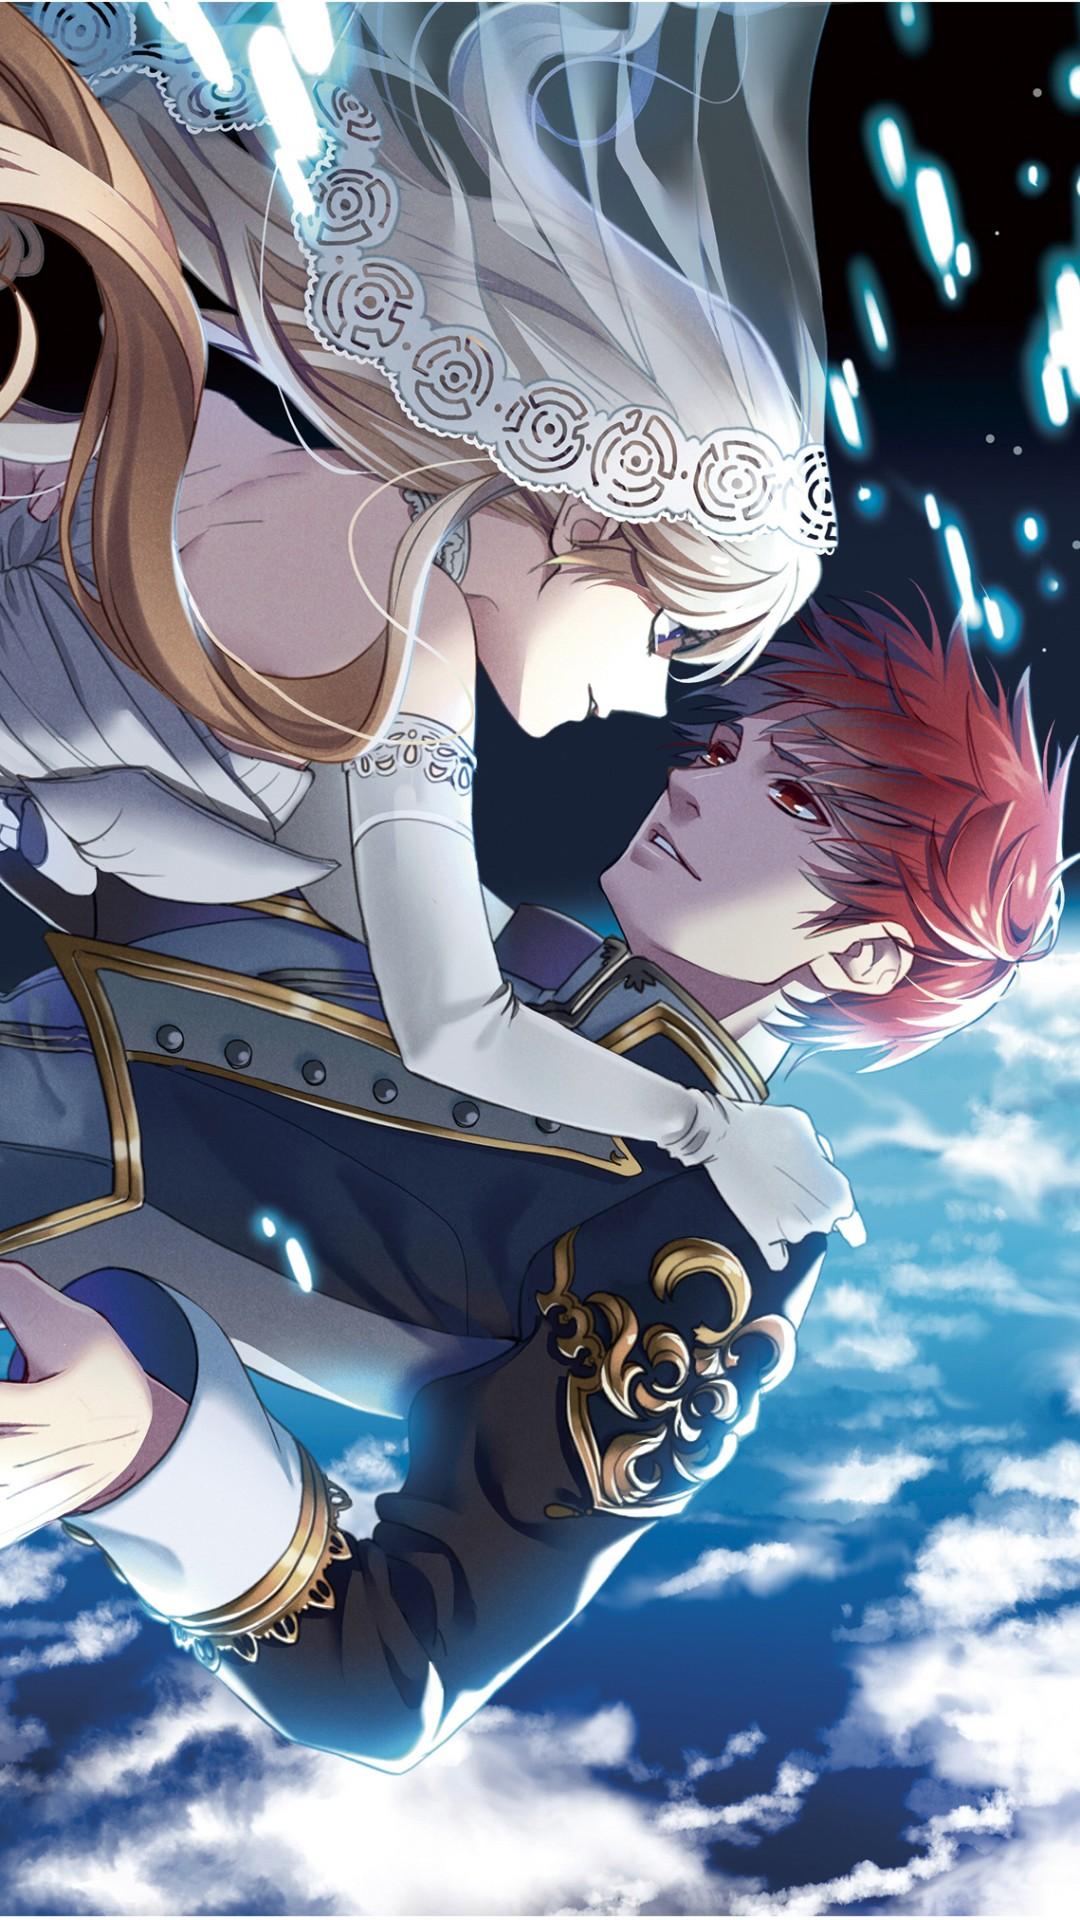 Wallpaper Anime Anime Couple Art 14461